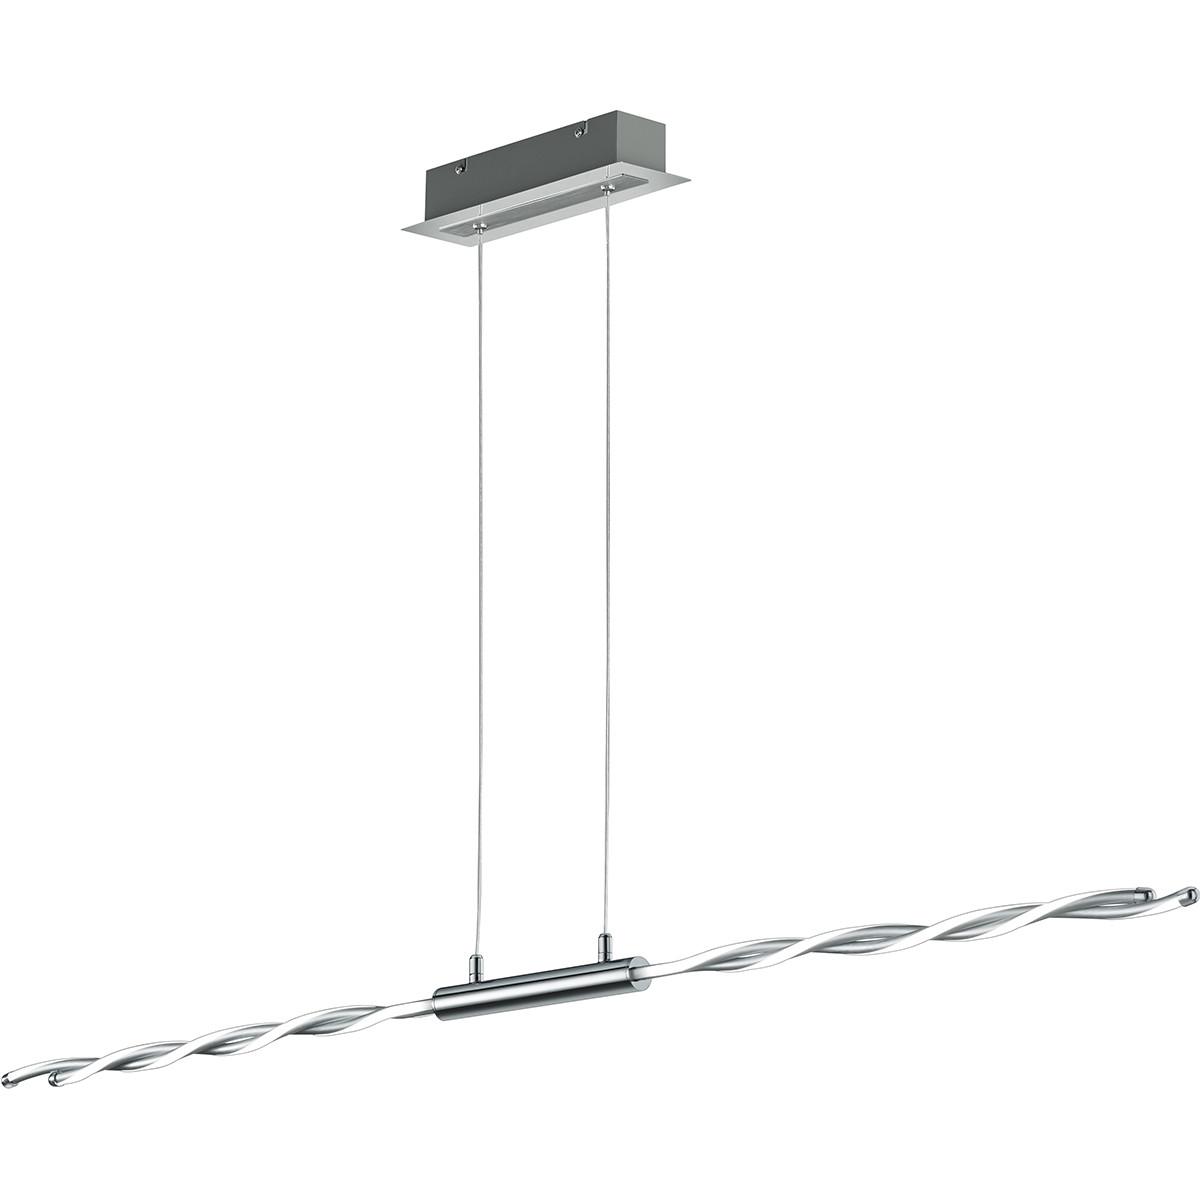 LED Hanglamp - Trion Partino - 28W - Warm Wit 3000K - 4-lichts - Dimbaar - Rechthoek - Glans Chroom